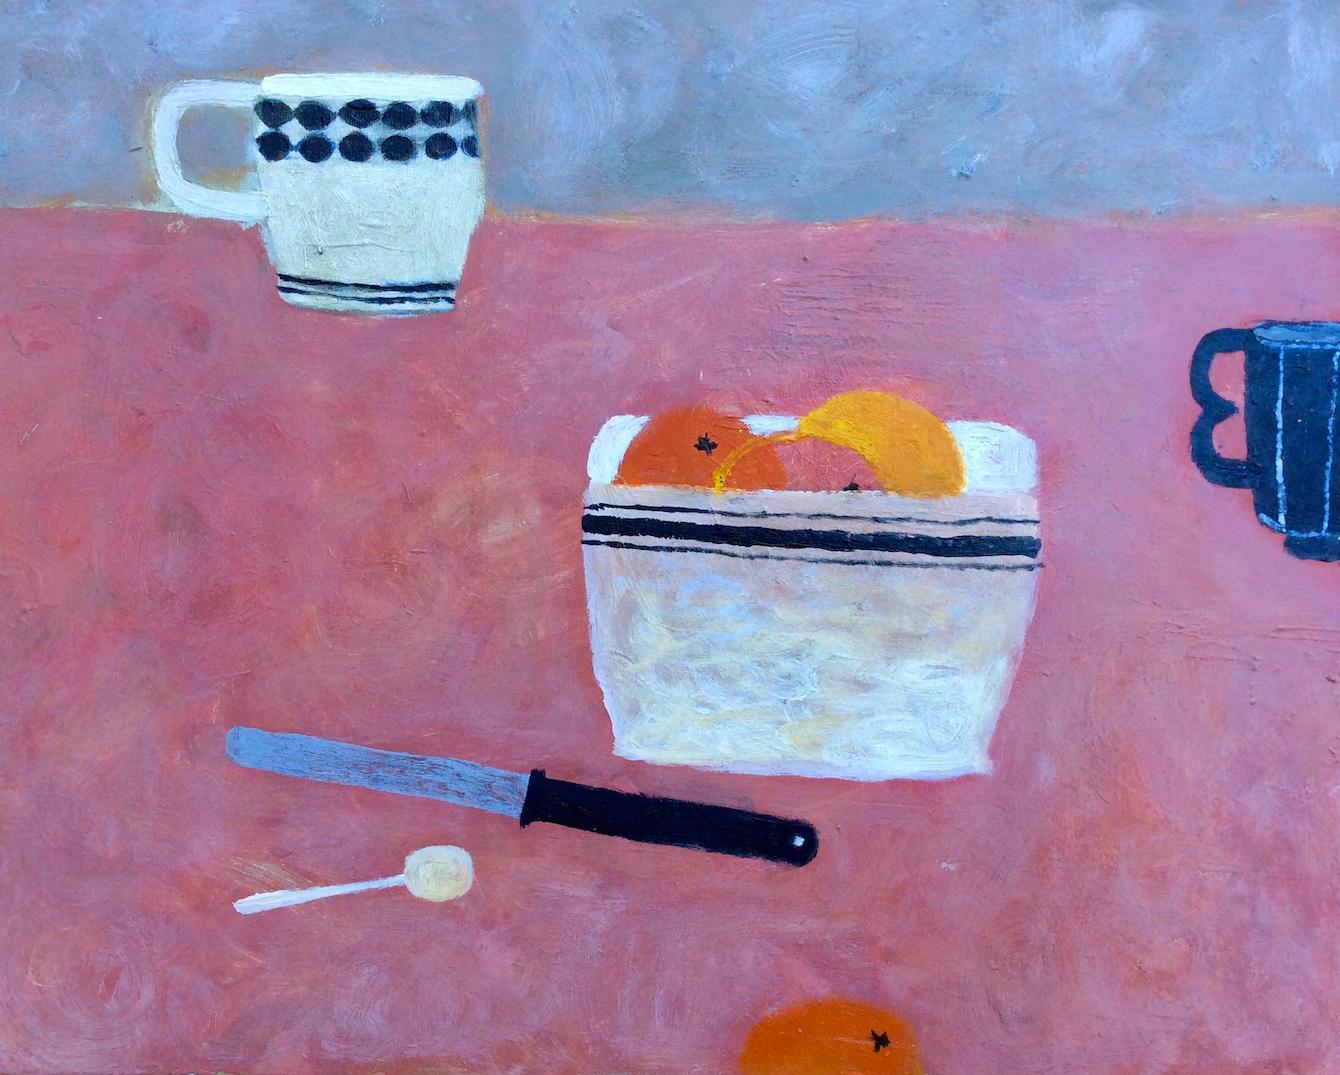 Title: Oranges on Pink Size: 40 x 50 cm Medium: Oil on canvas